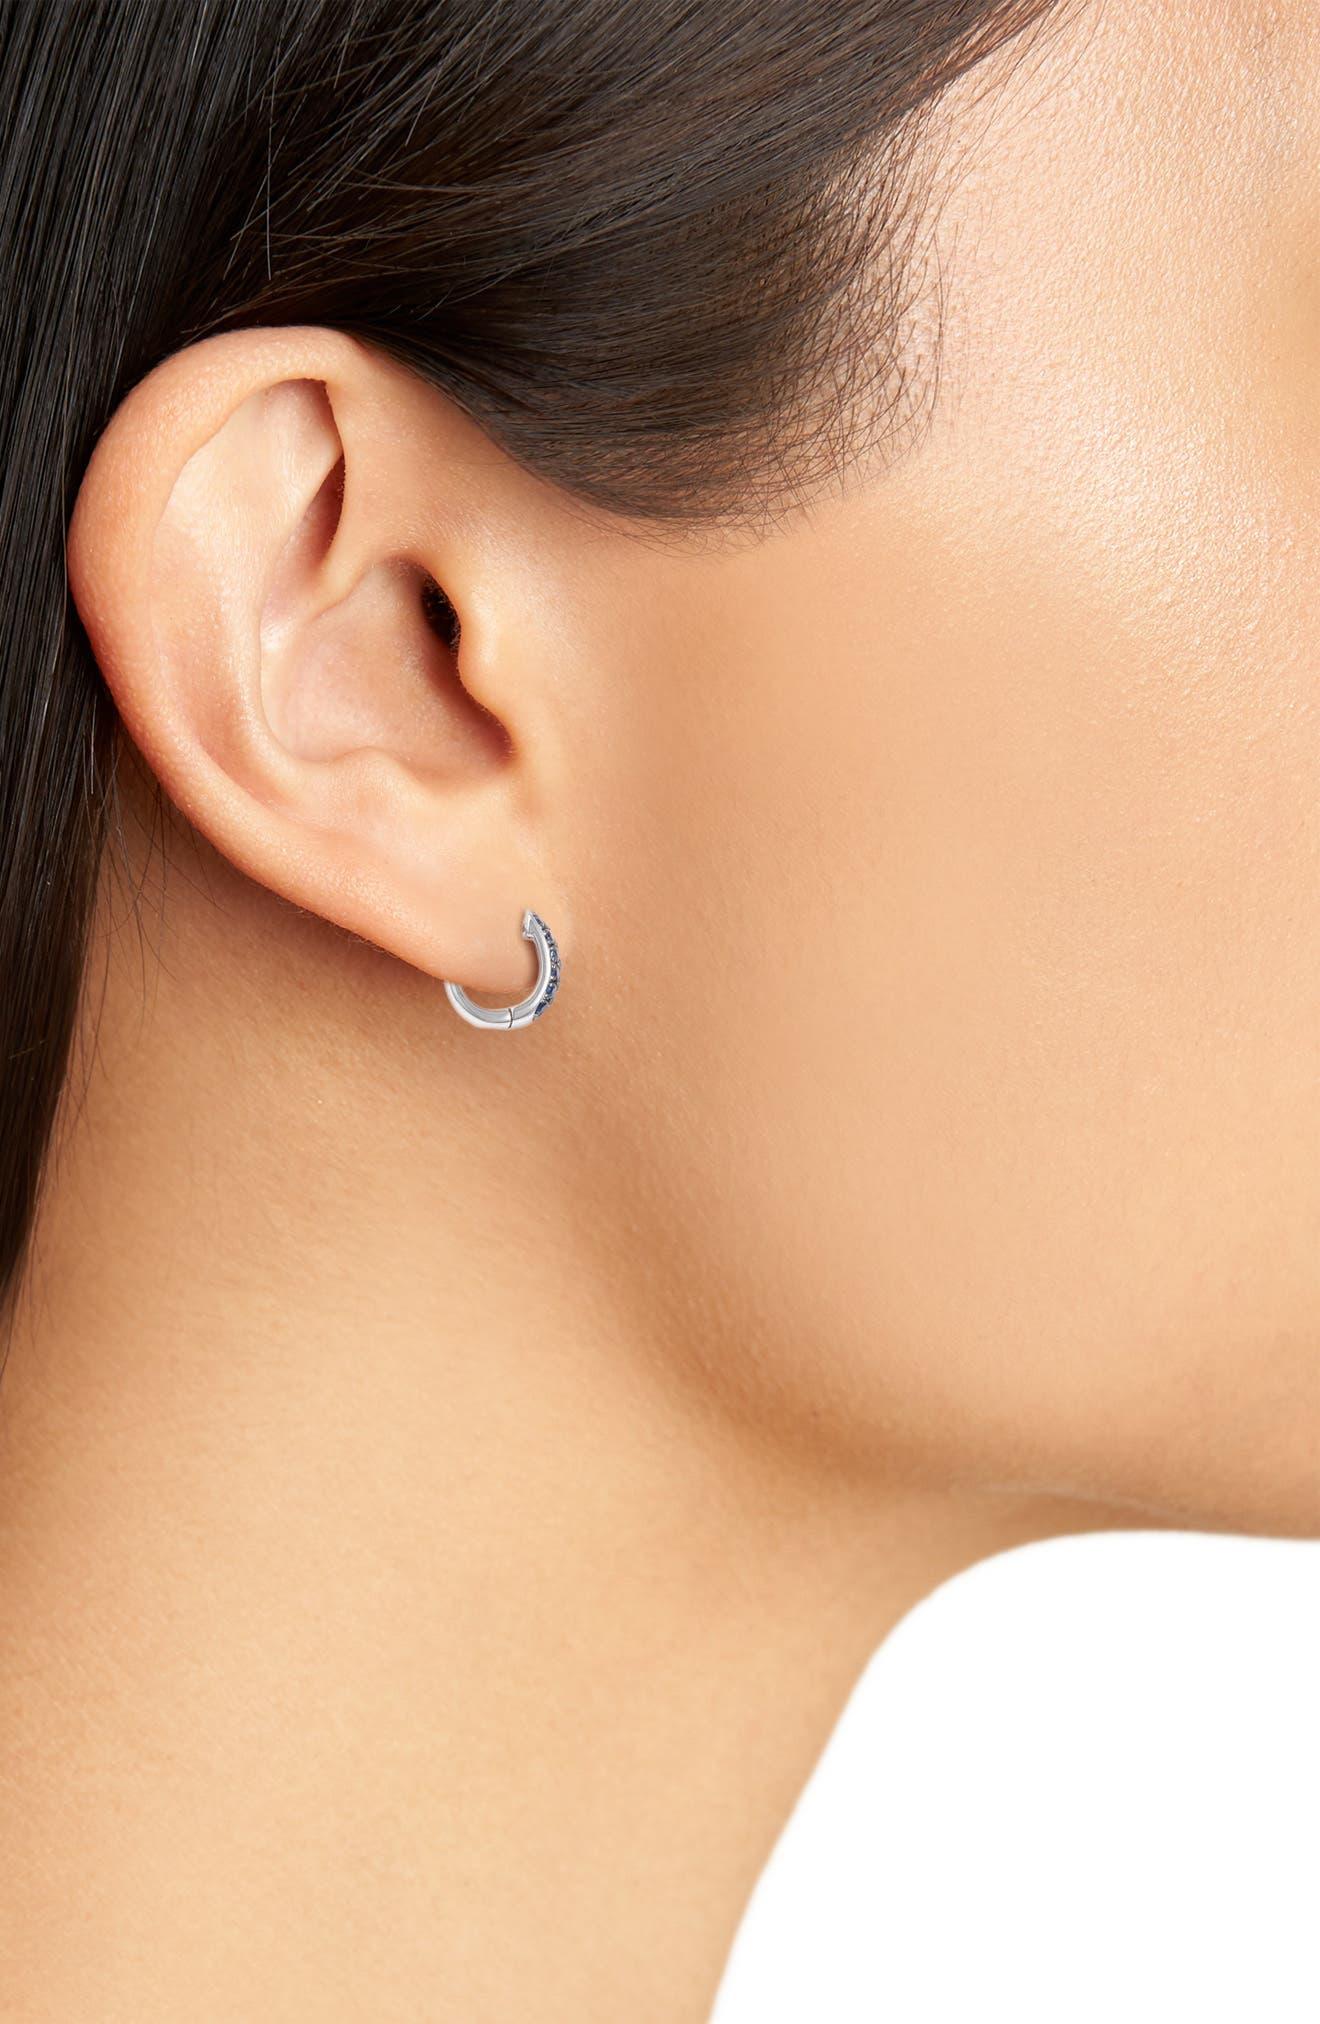 Wide Gem Huggie Earrings,                             Alternate thumbnail 2, color,                             YELLOW GOLD/ BLUE SAPPHIRE